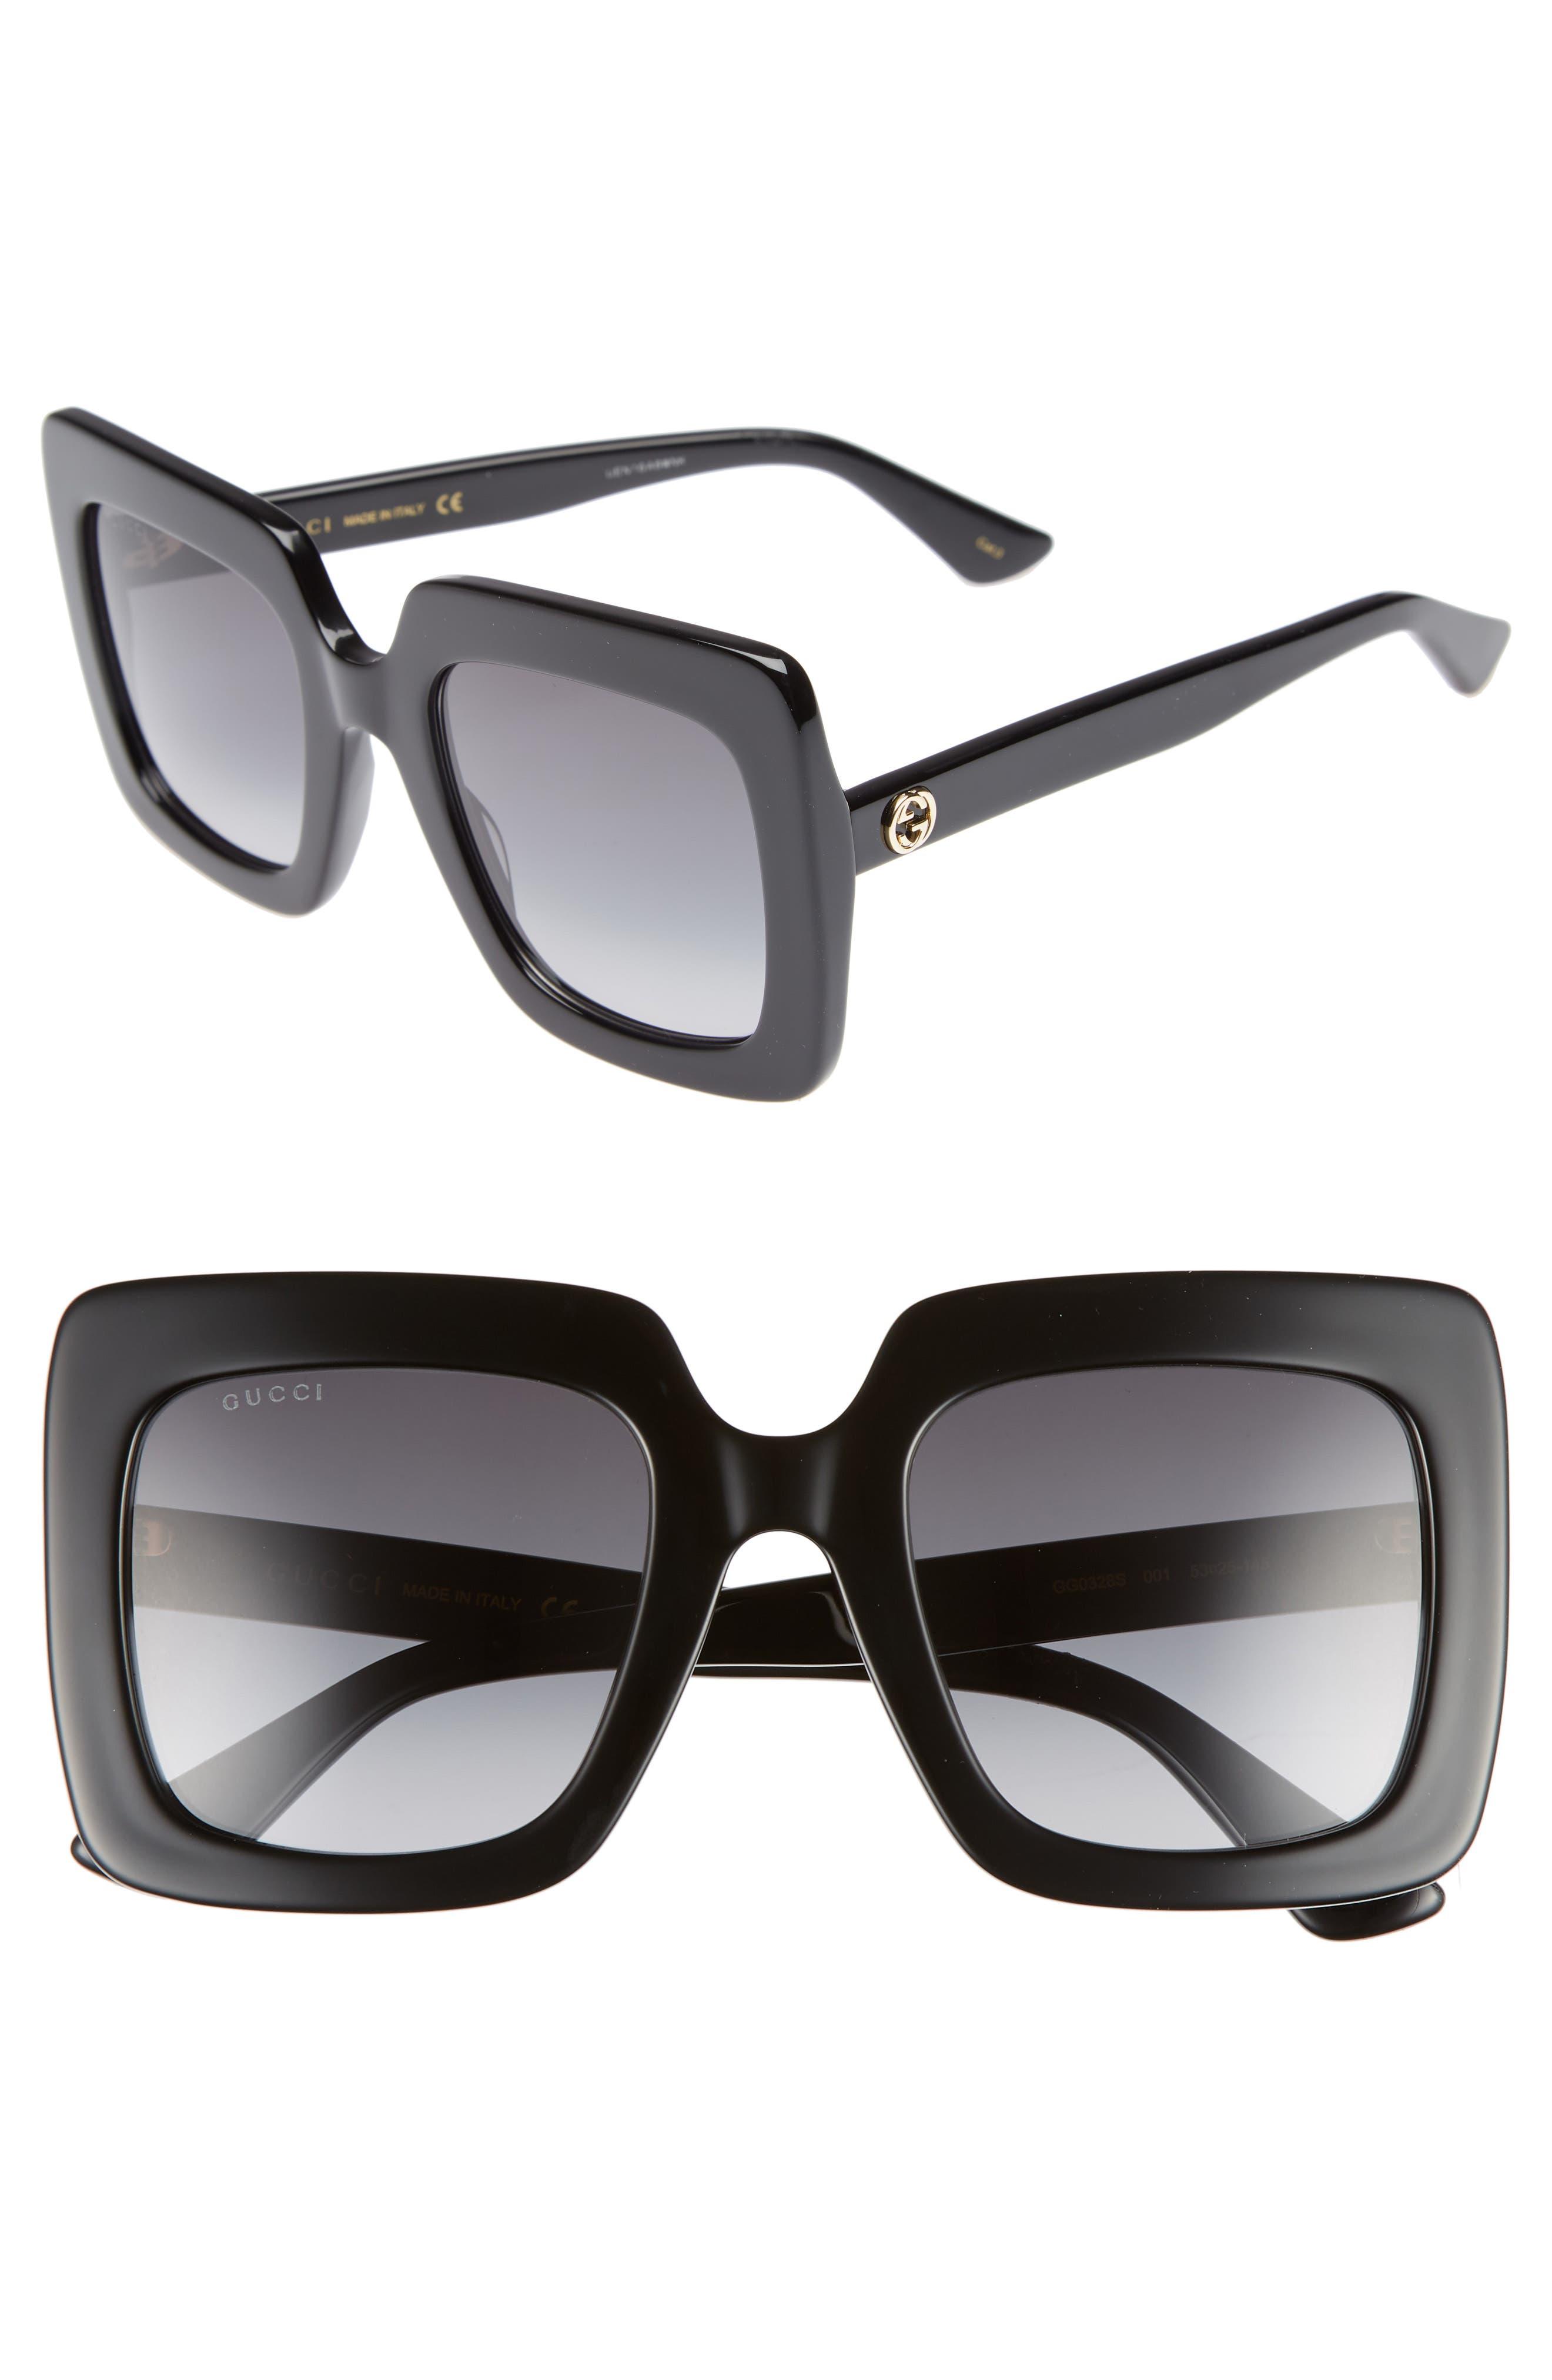 GUCCI, 53mm Square Sunglasses, Main thumbnail 1, color, BLACK